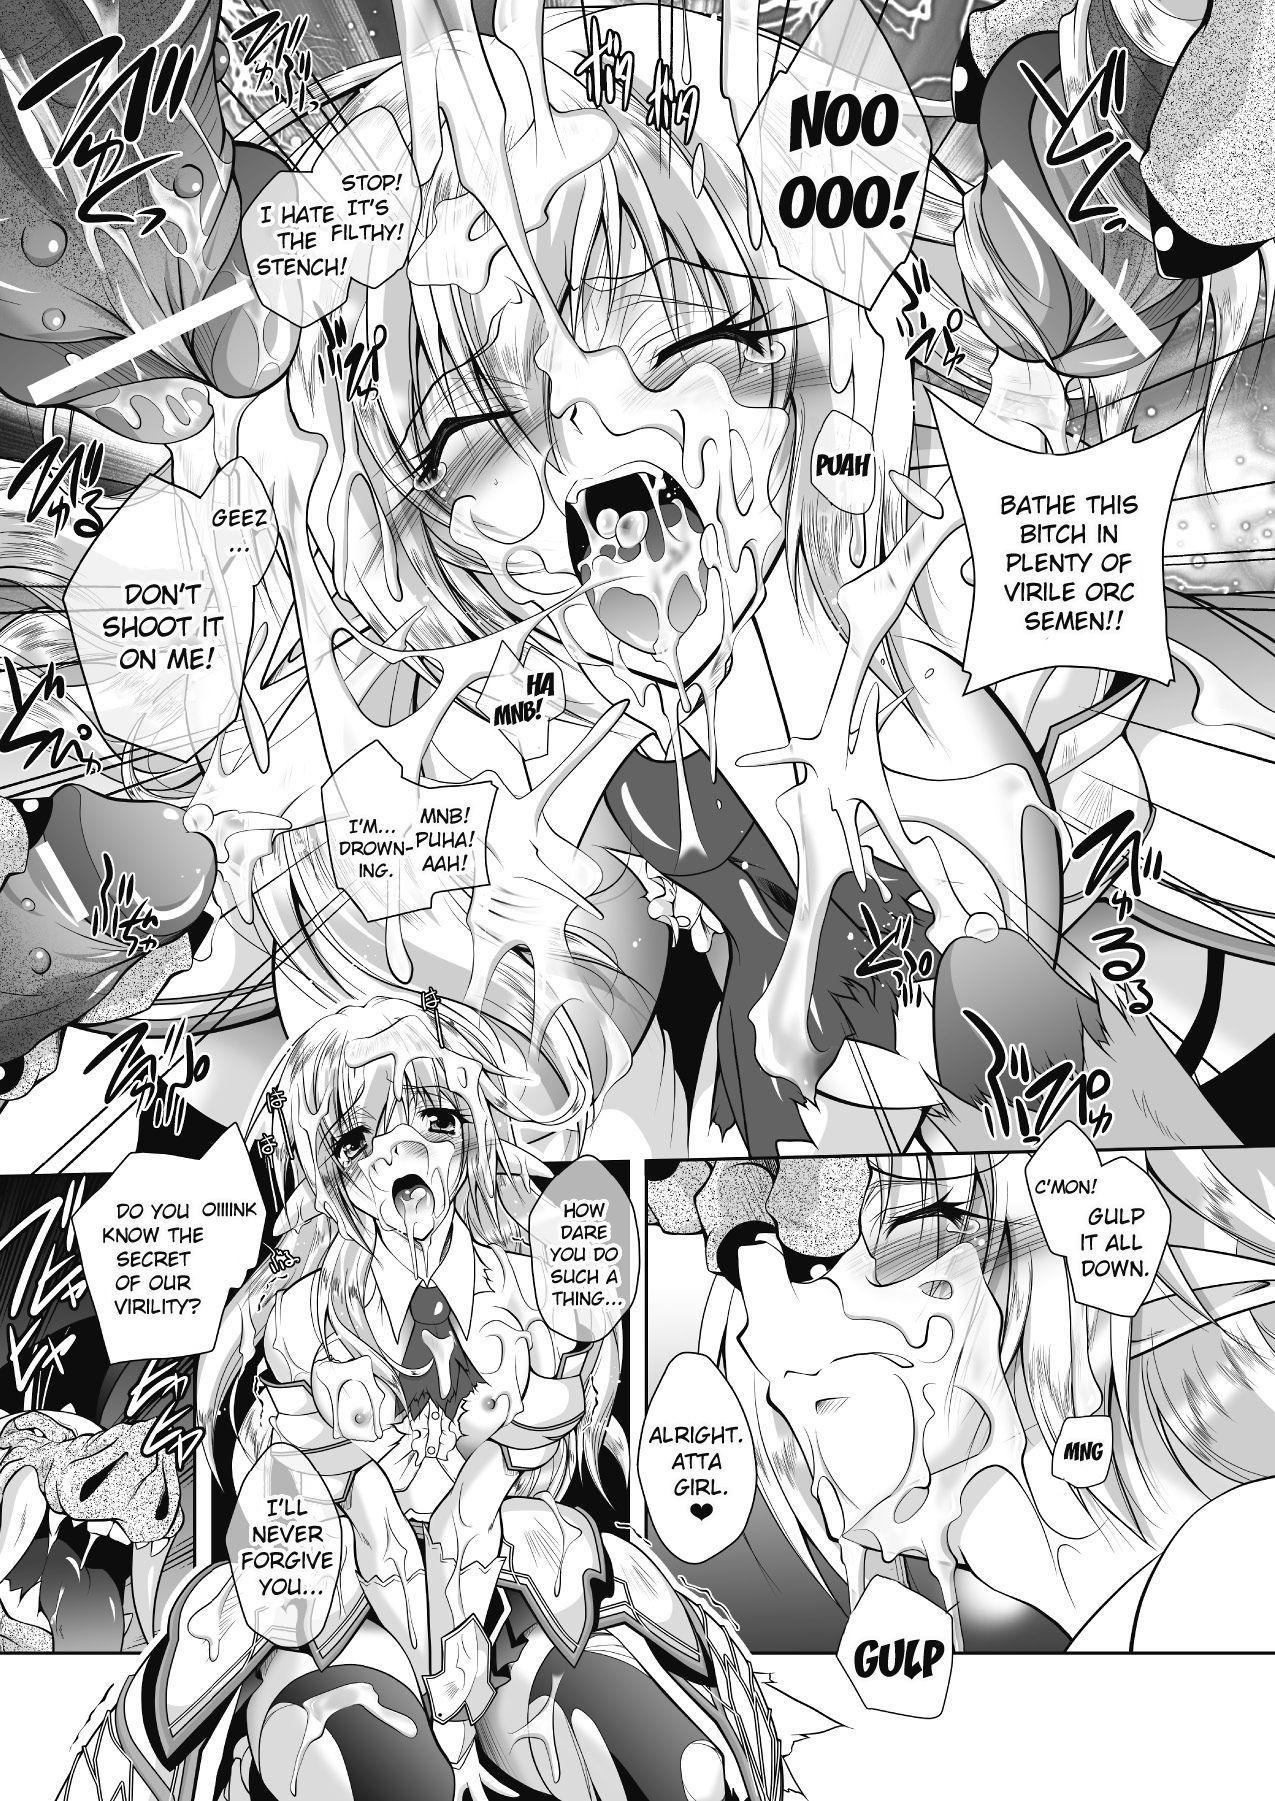 Juuyoku ni Kegareta Erufu Hime Kishi Sefiria | An Elf Sullied by Bestial Lust Princess Knight Sefiria 8